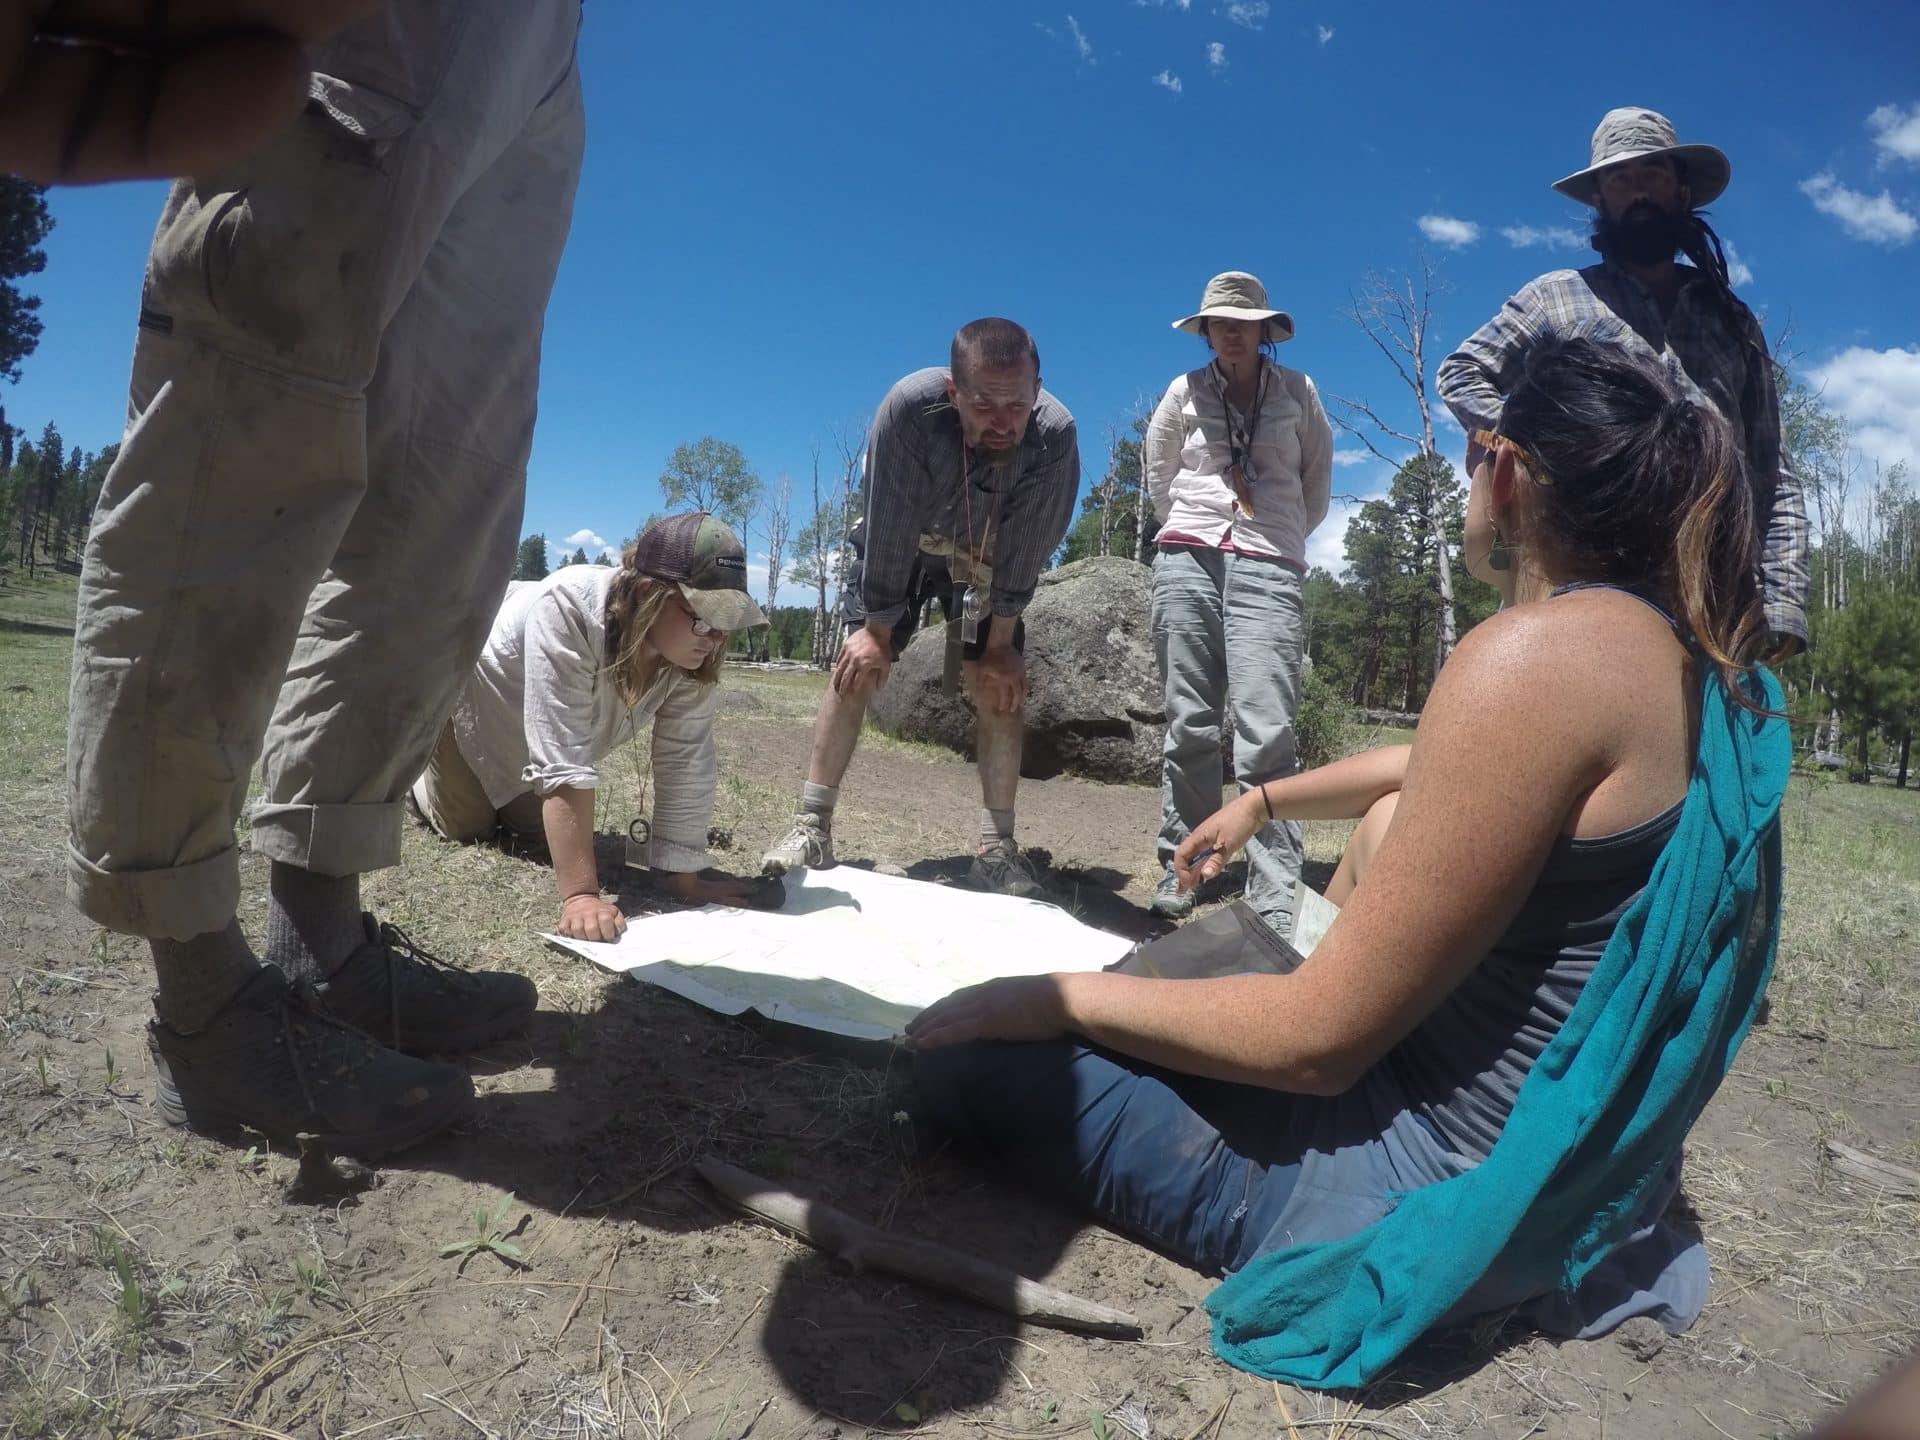 wilderness survival experts